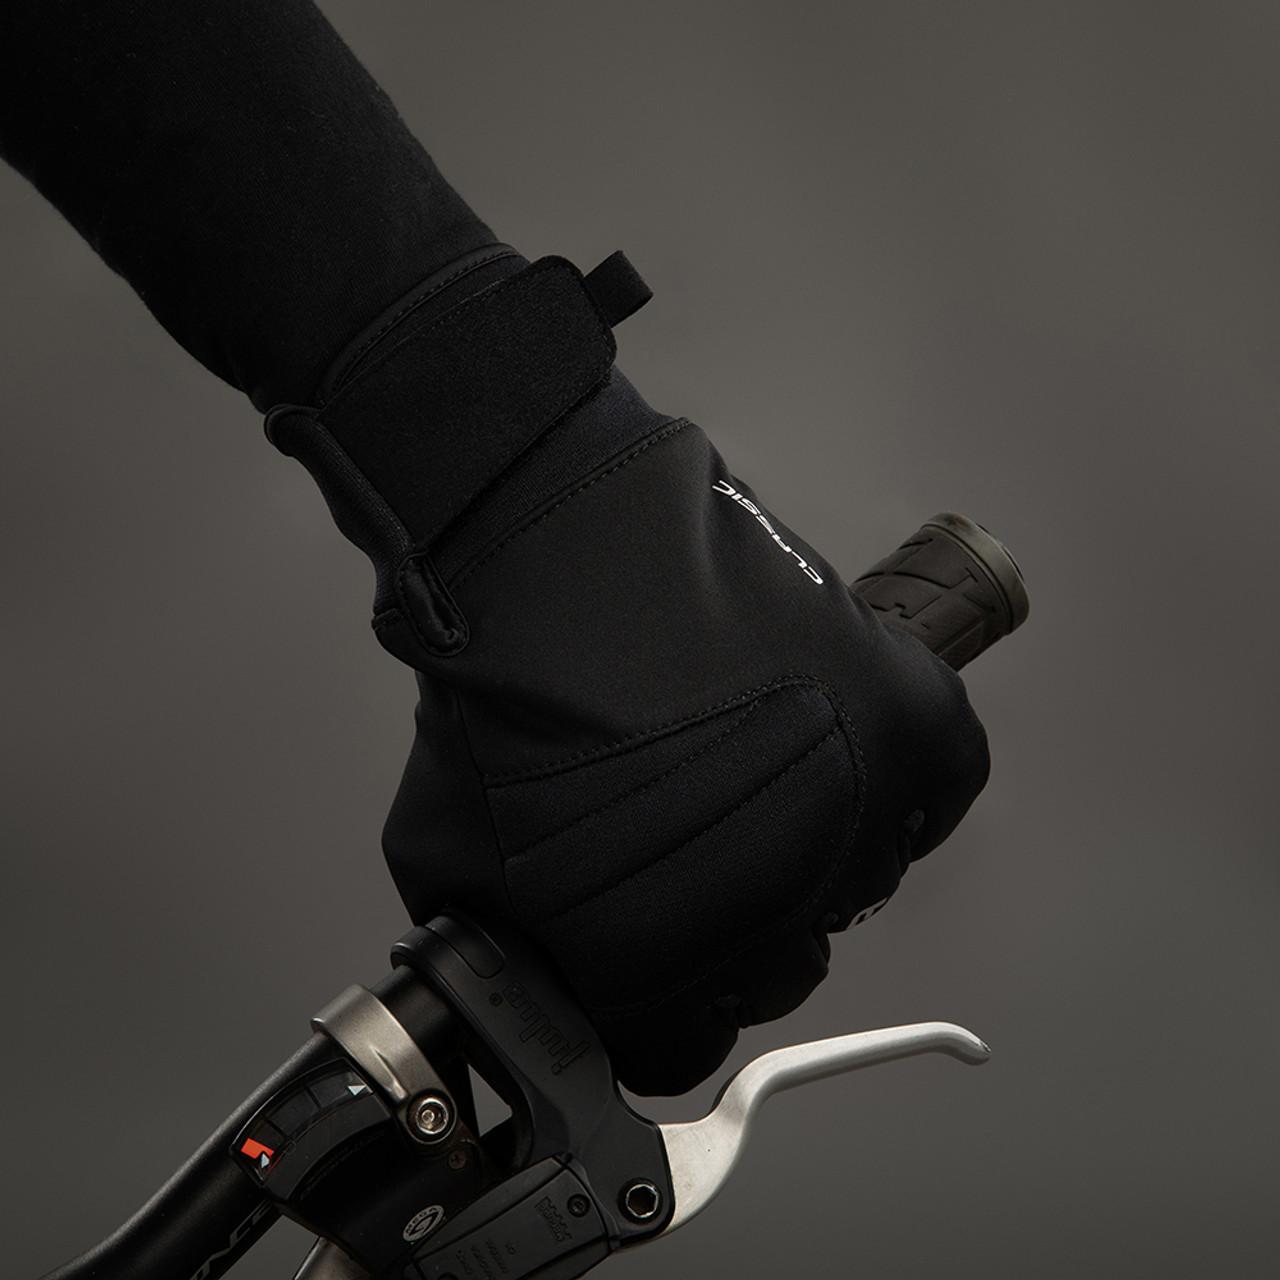 Chiba Classic II Windstopper Winter Gloves in Black All Sizes